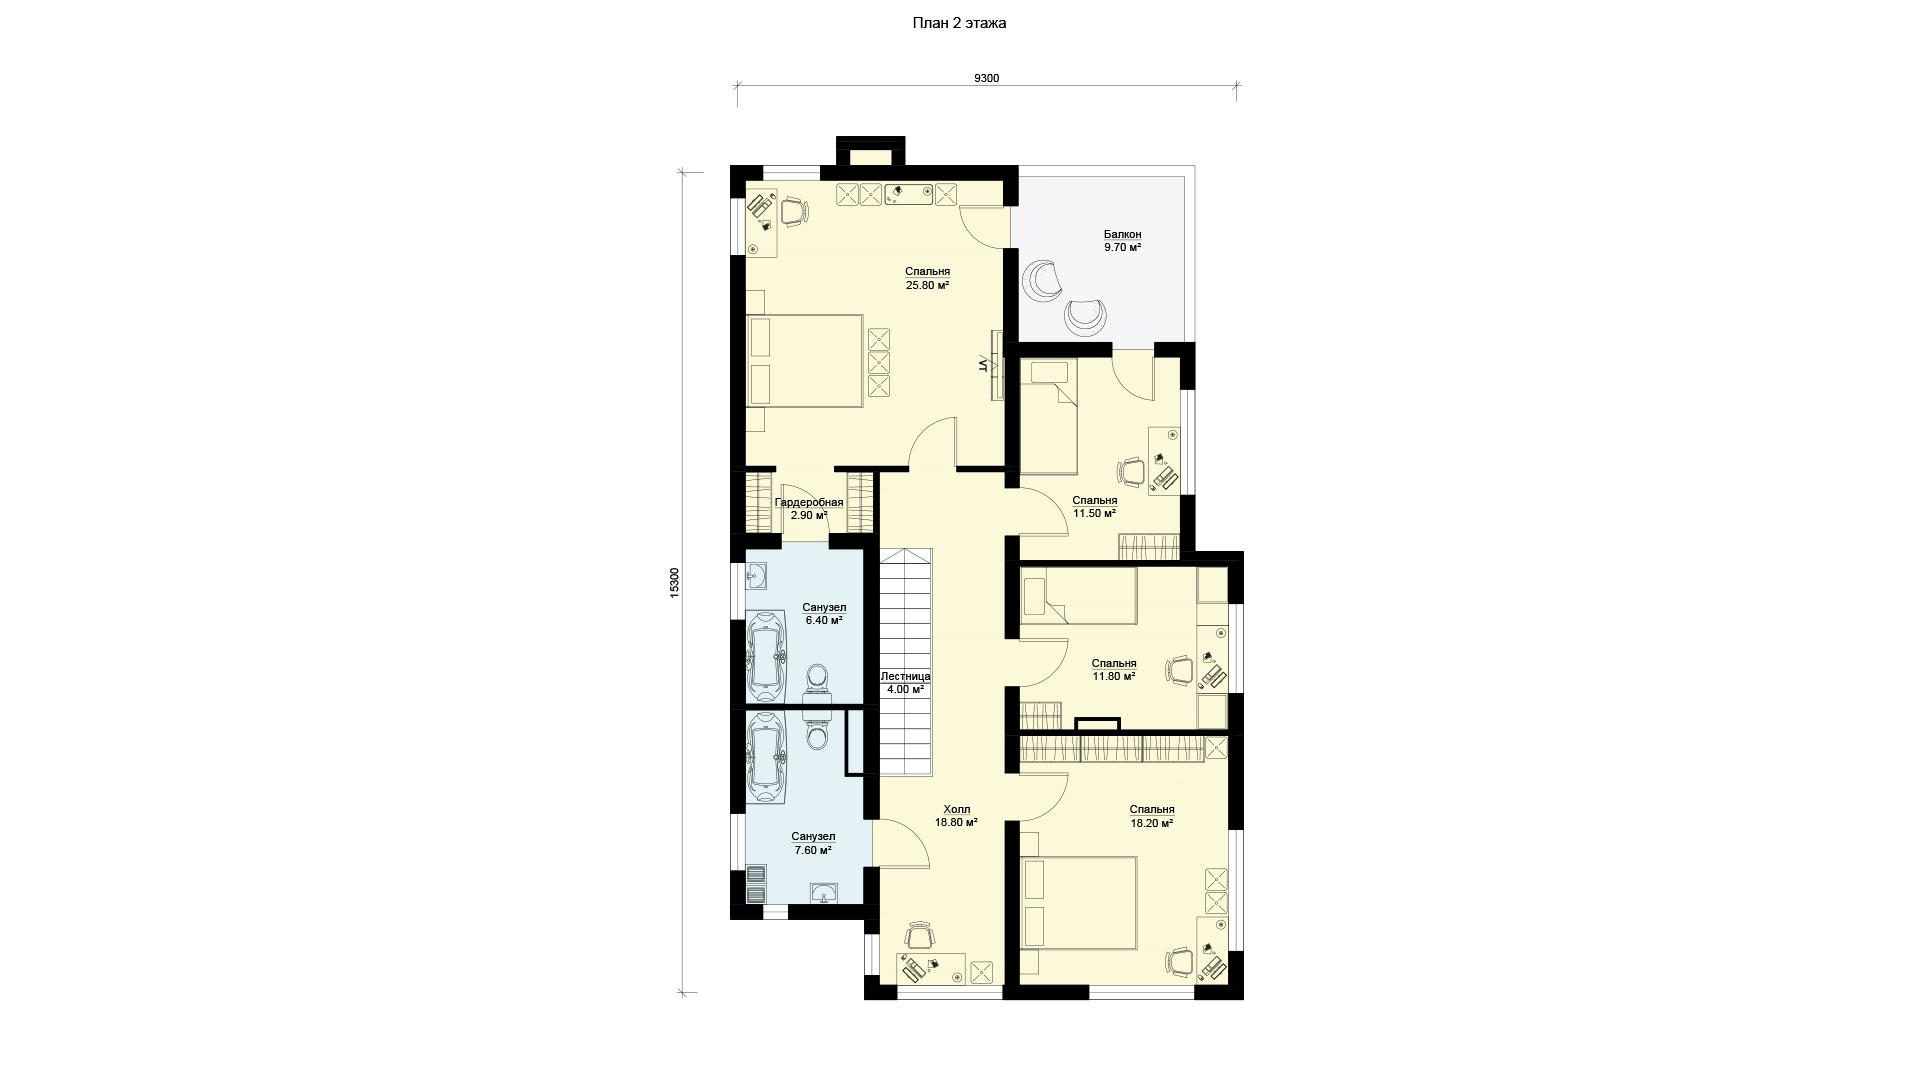 План второго этажа двухэтажного дома 15 на 15, проект БЭНПАН БП-289.